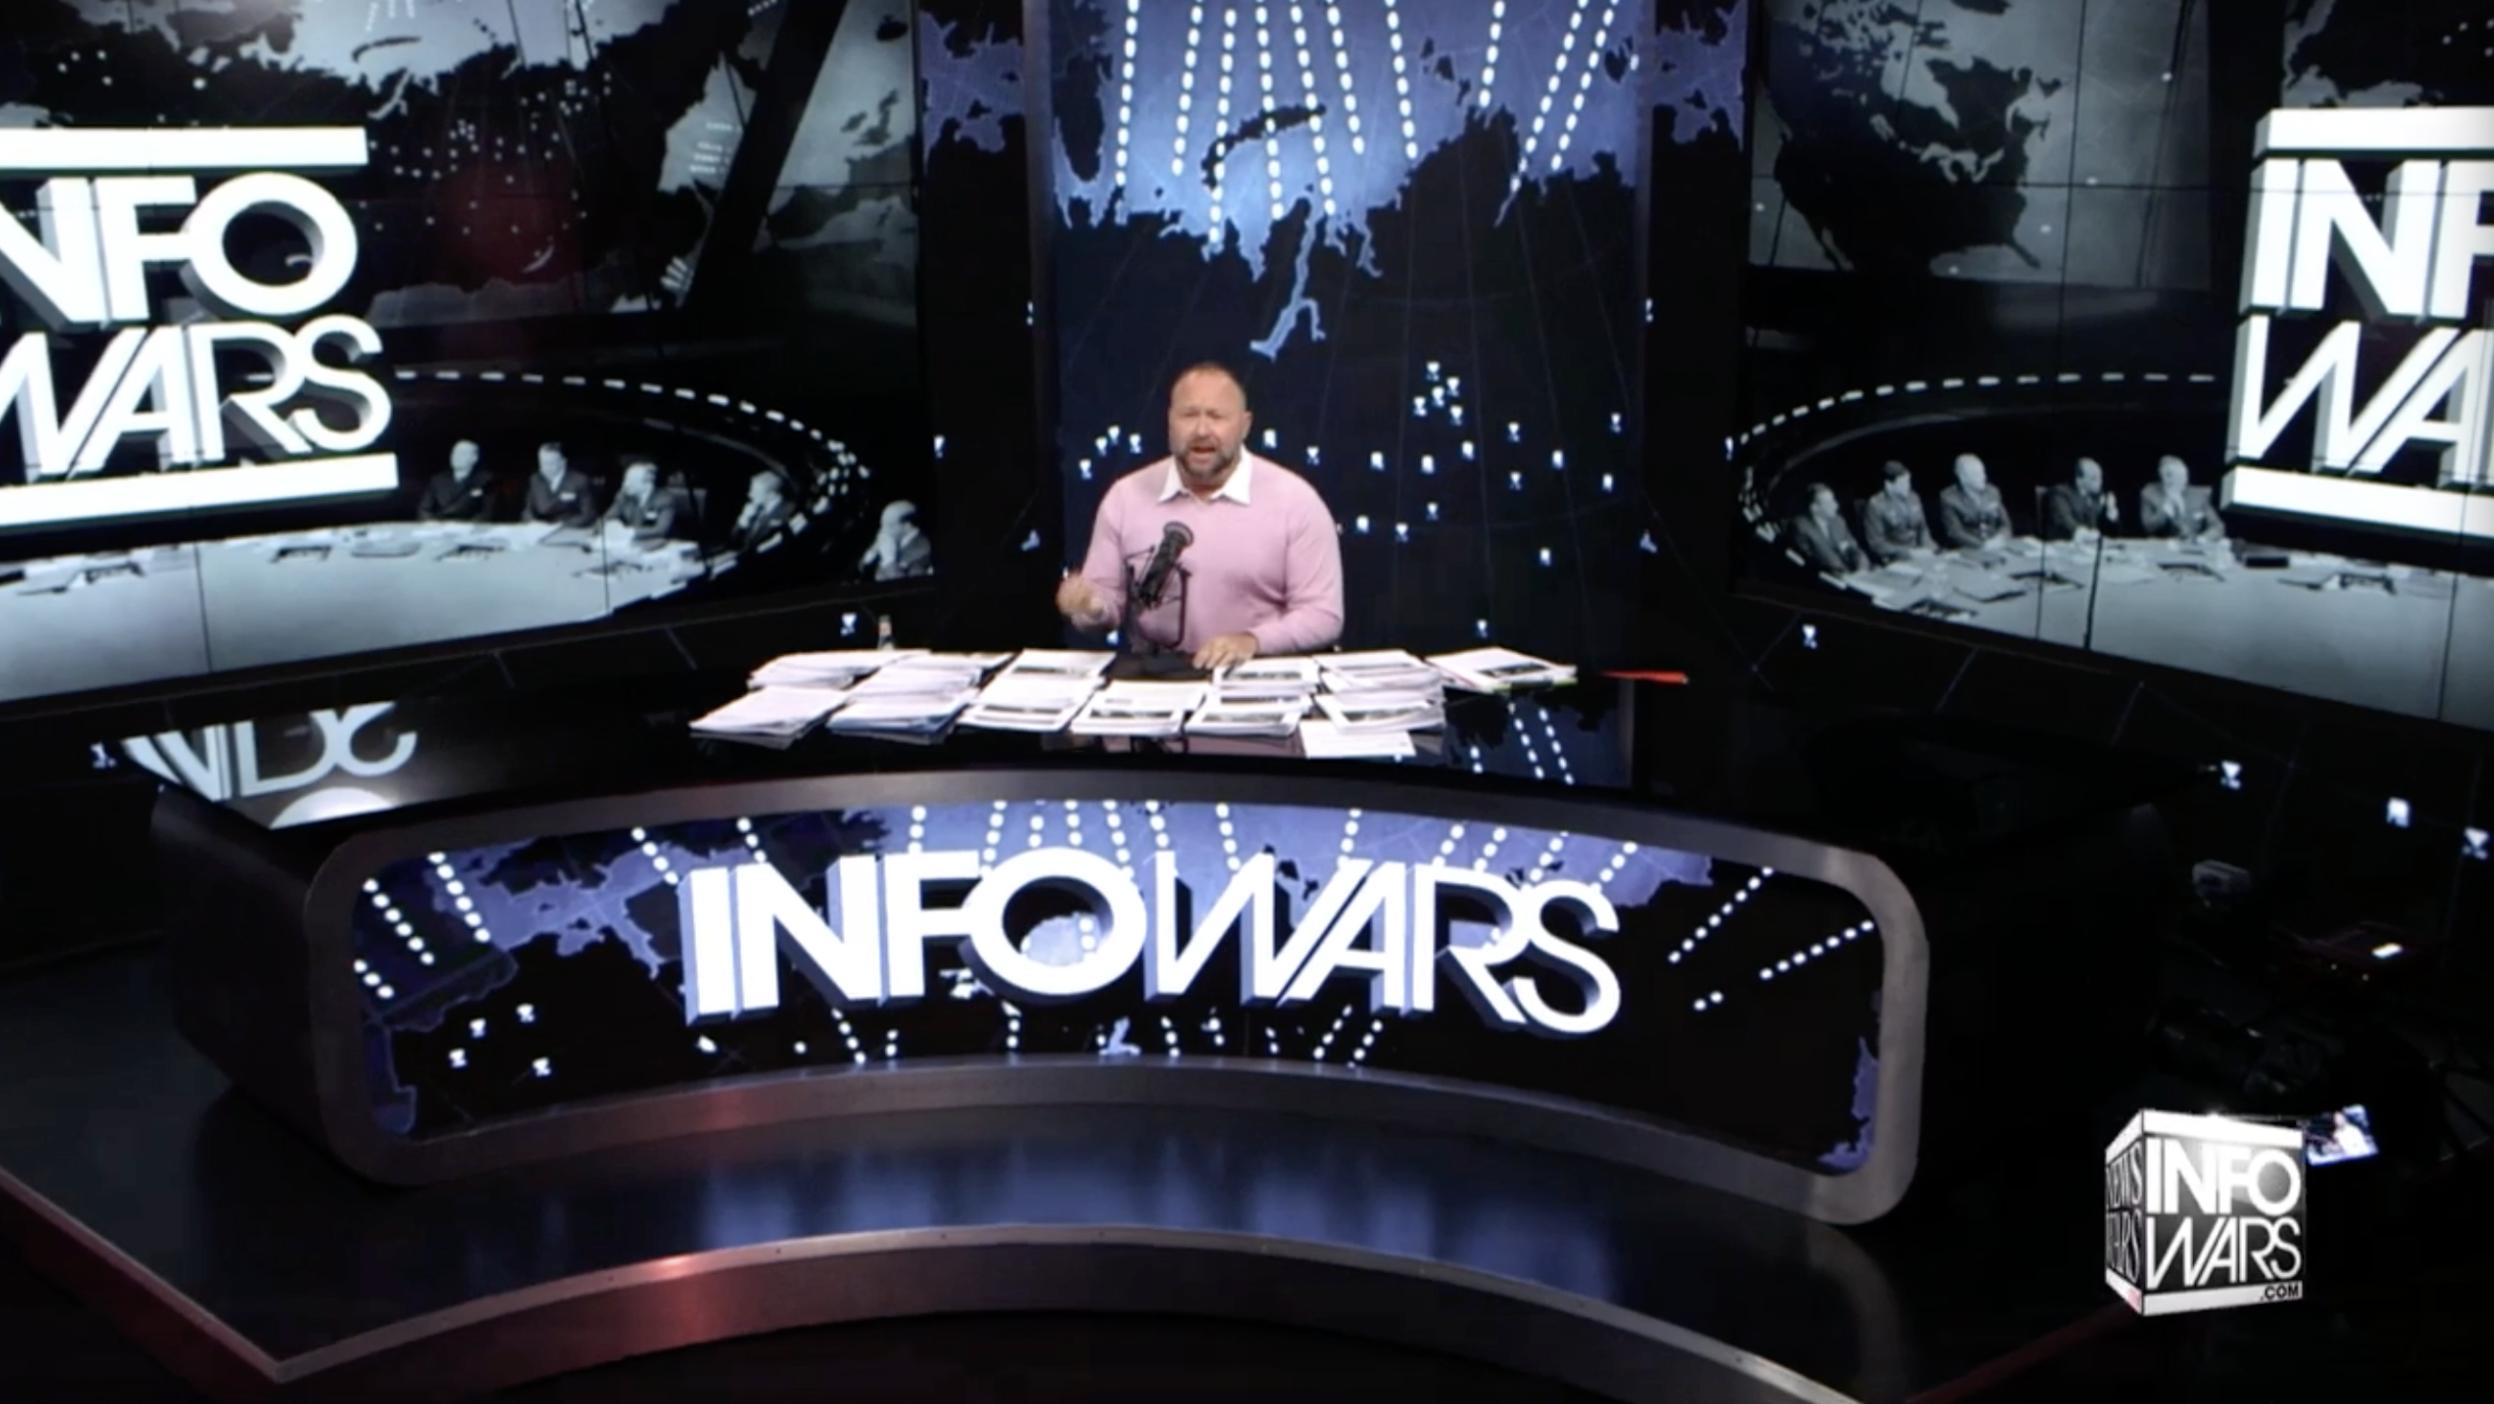 Alex Jones Infowars Pink shirt 5 11 2020